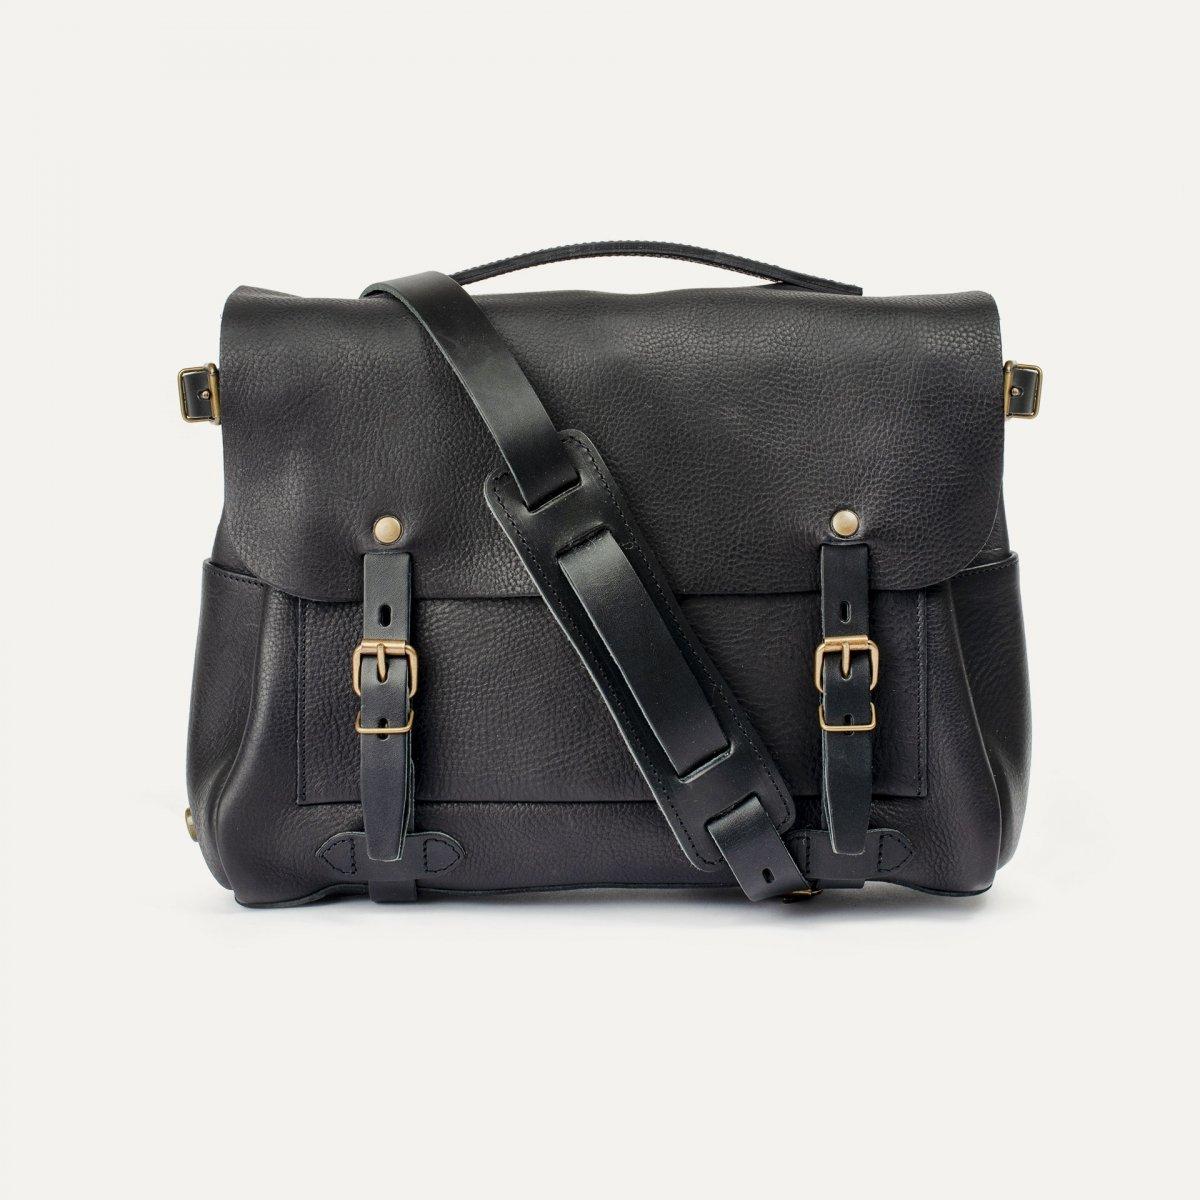 Postman bag Éclair M - Black (image n°1)